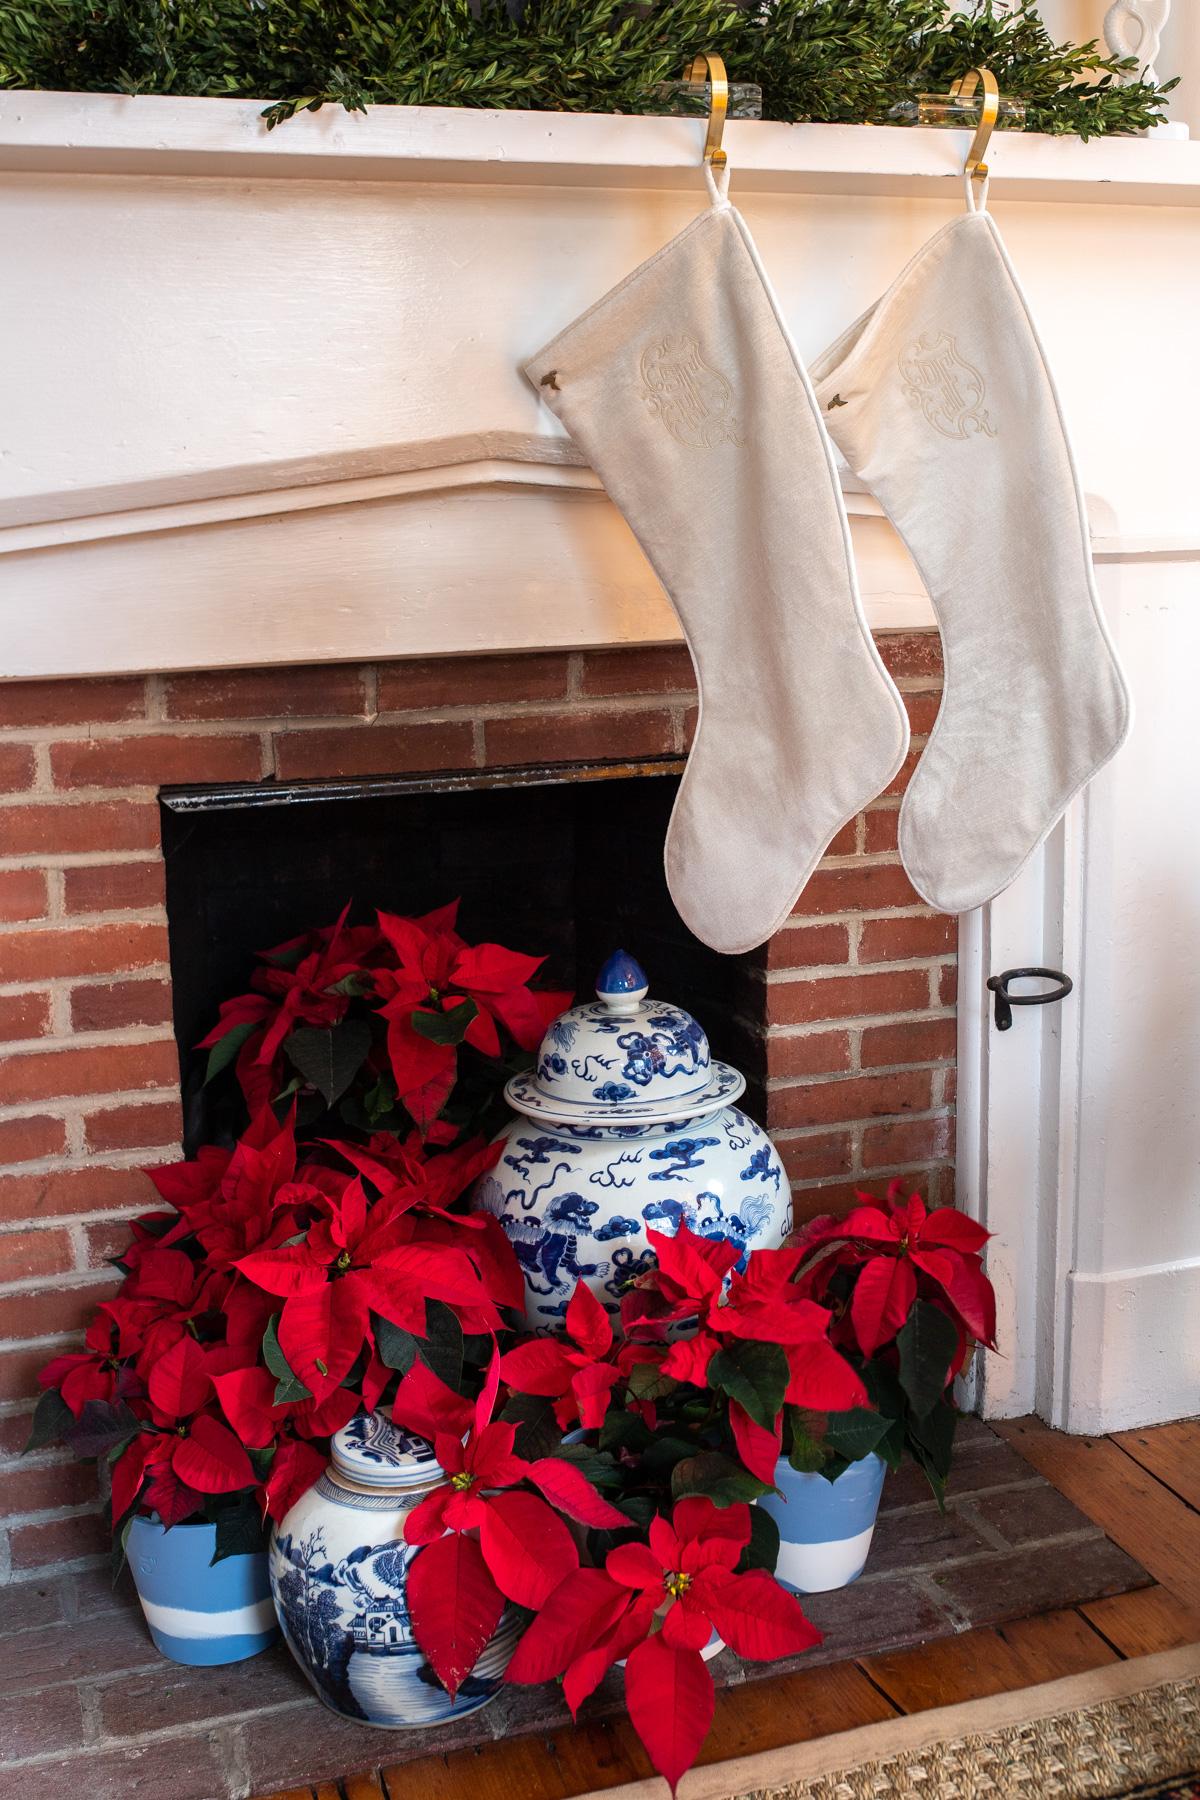 Stacie Flinner x New England Holiday Decorations-11.jpg